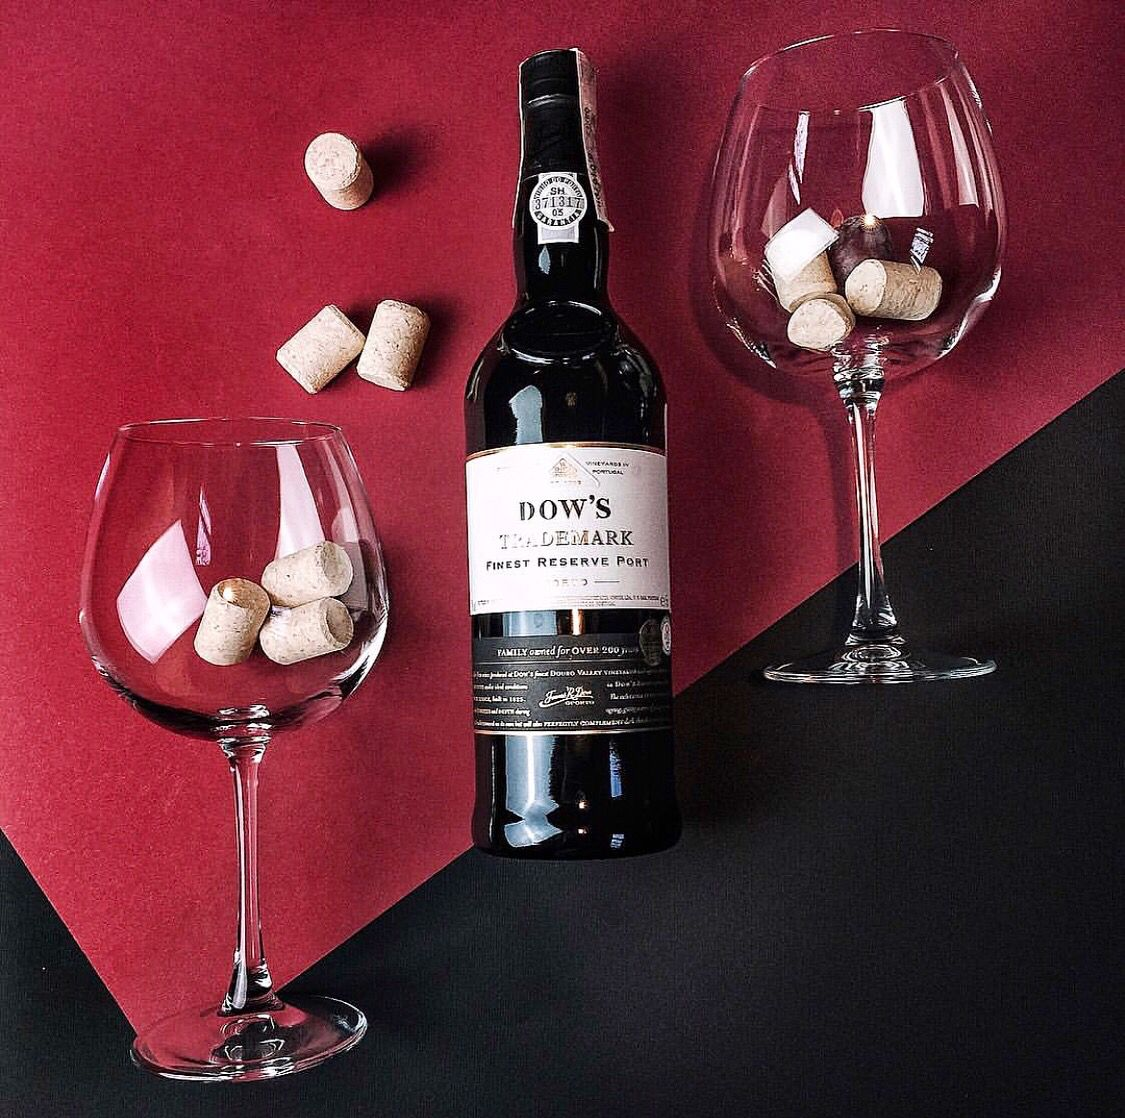 Wineglass Wine Love Glasses Glass Vinglas Winelover Winelife Redwine Redwineglass Winetime Winefordays Winepic Wine Glasses Wine Lovers Wine Glass